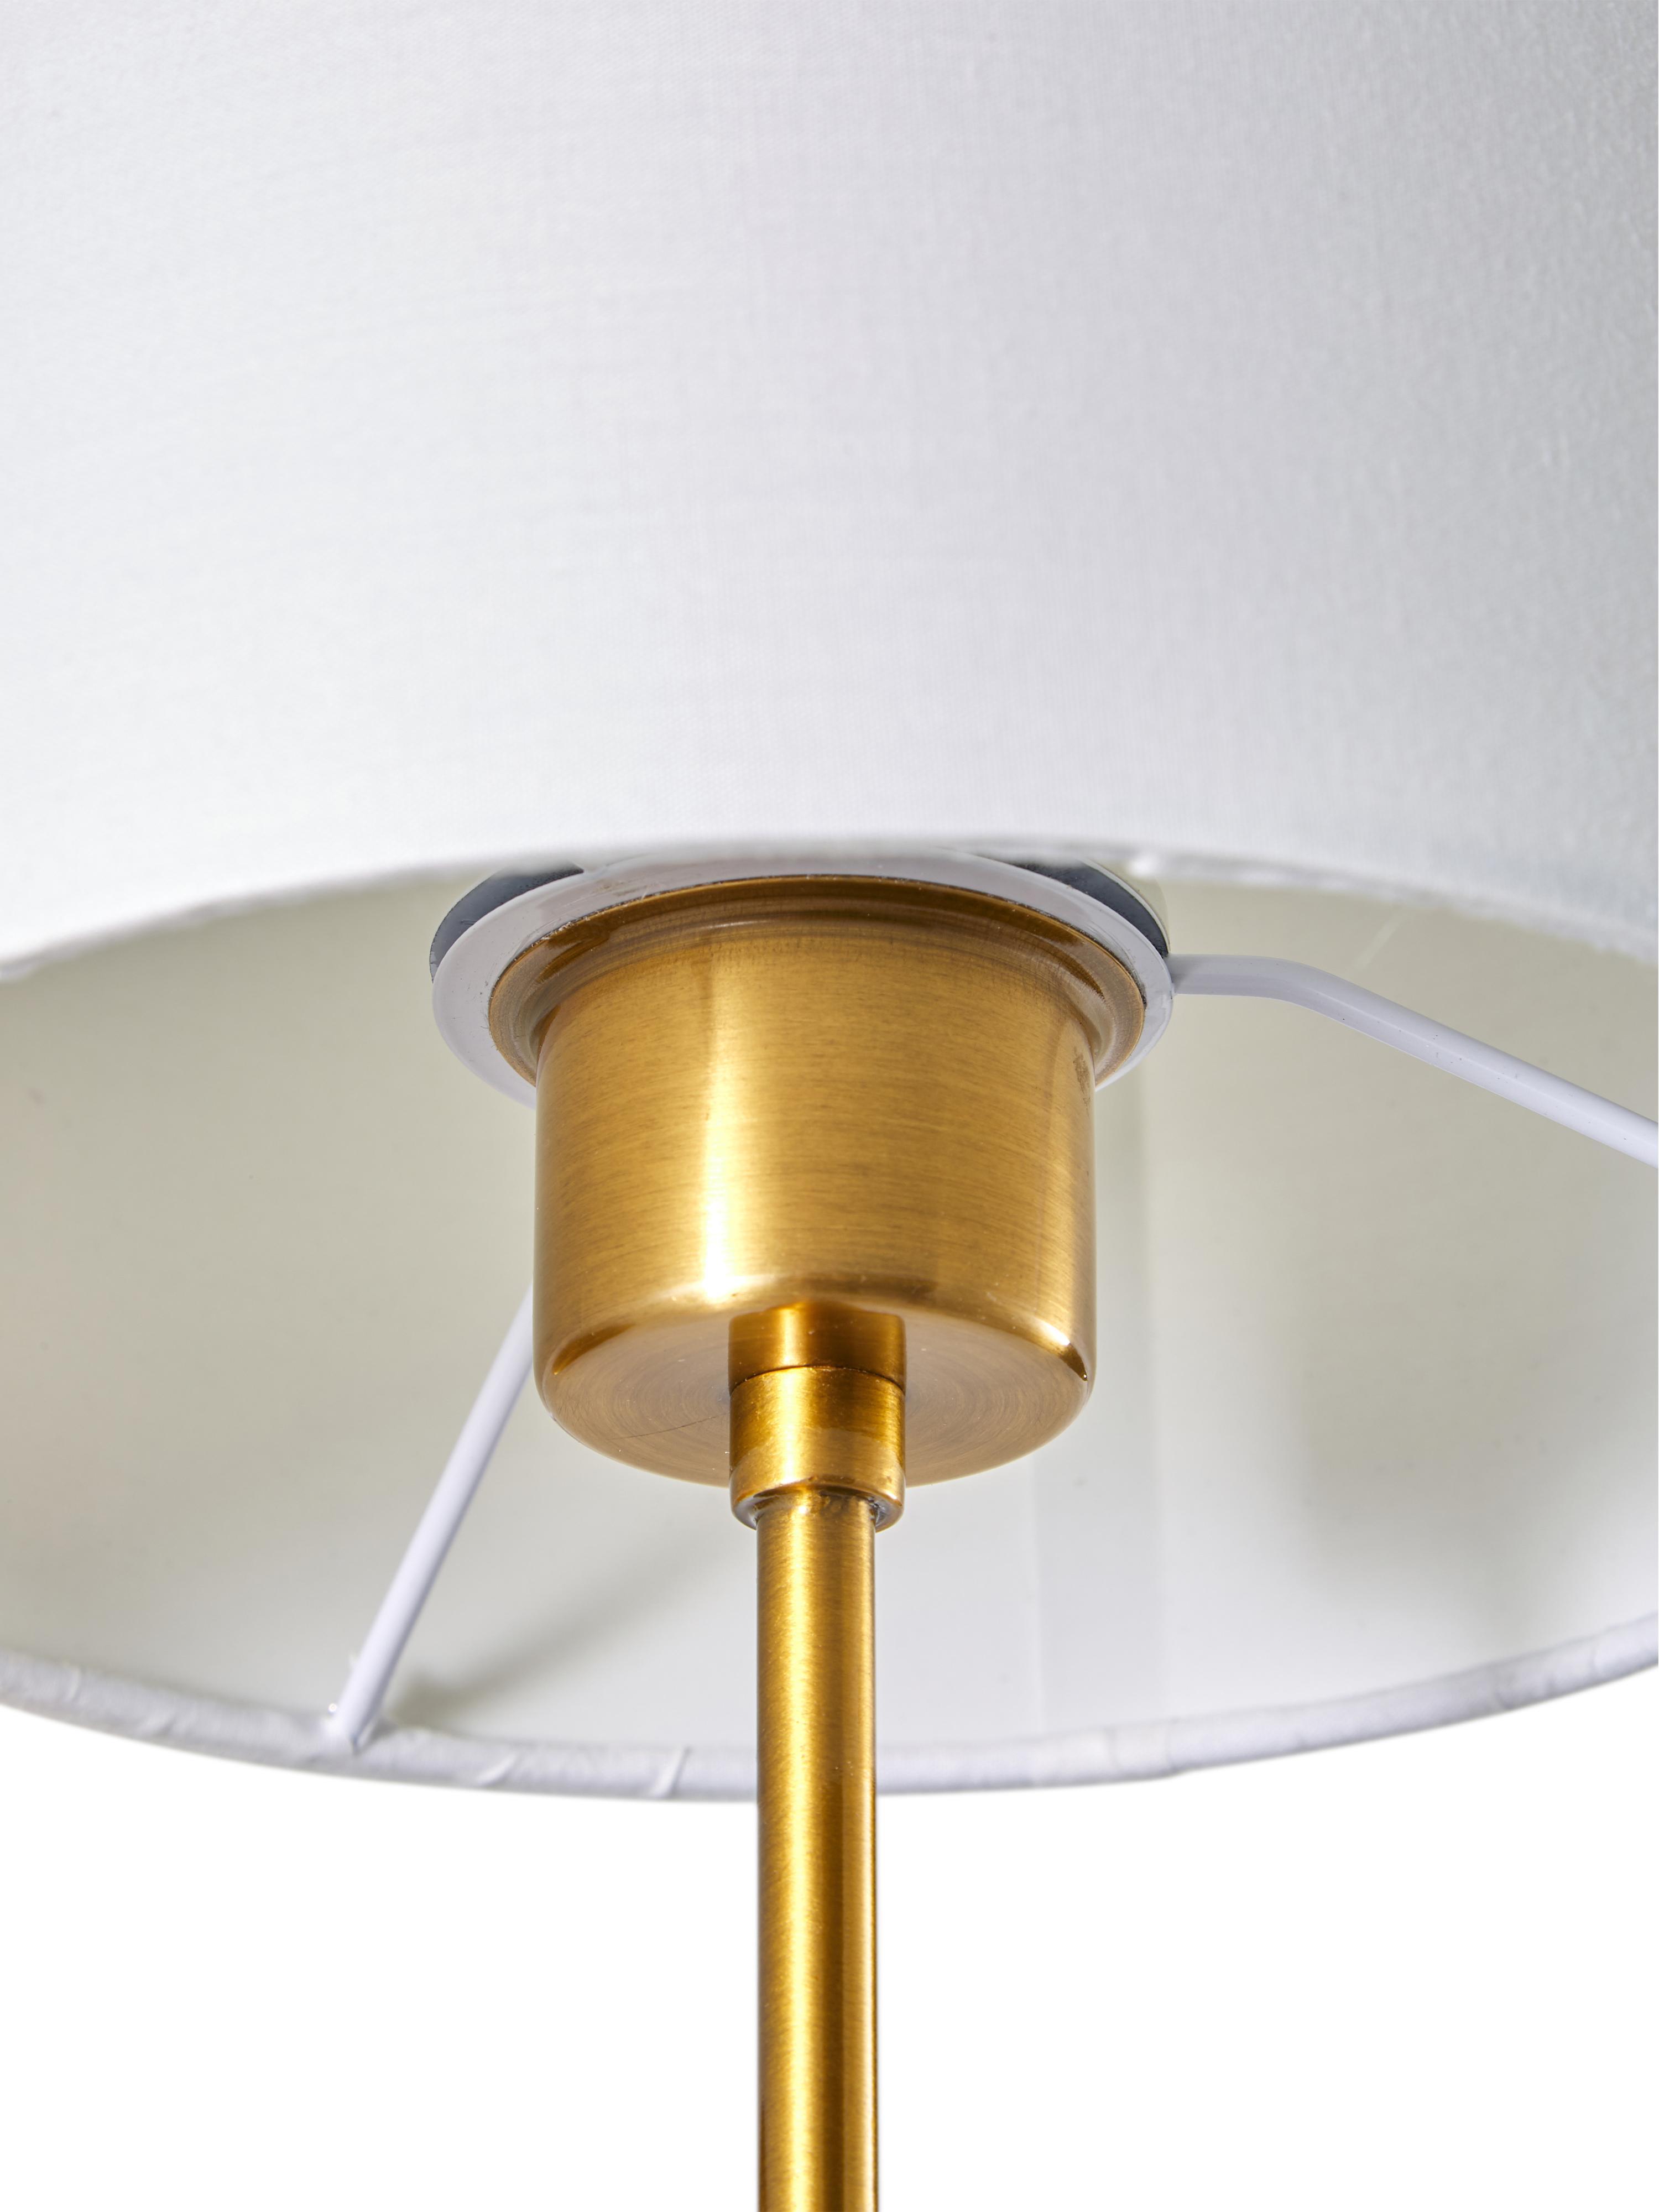 Applique Montreal, Paralume: tessuto, Struttura: metallo zincato, Bianco, dorato, Ø 20 x Alt. 36 cm